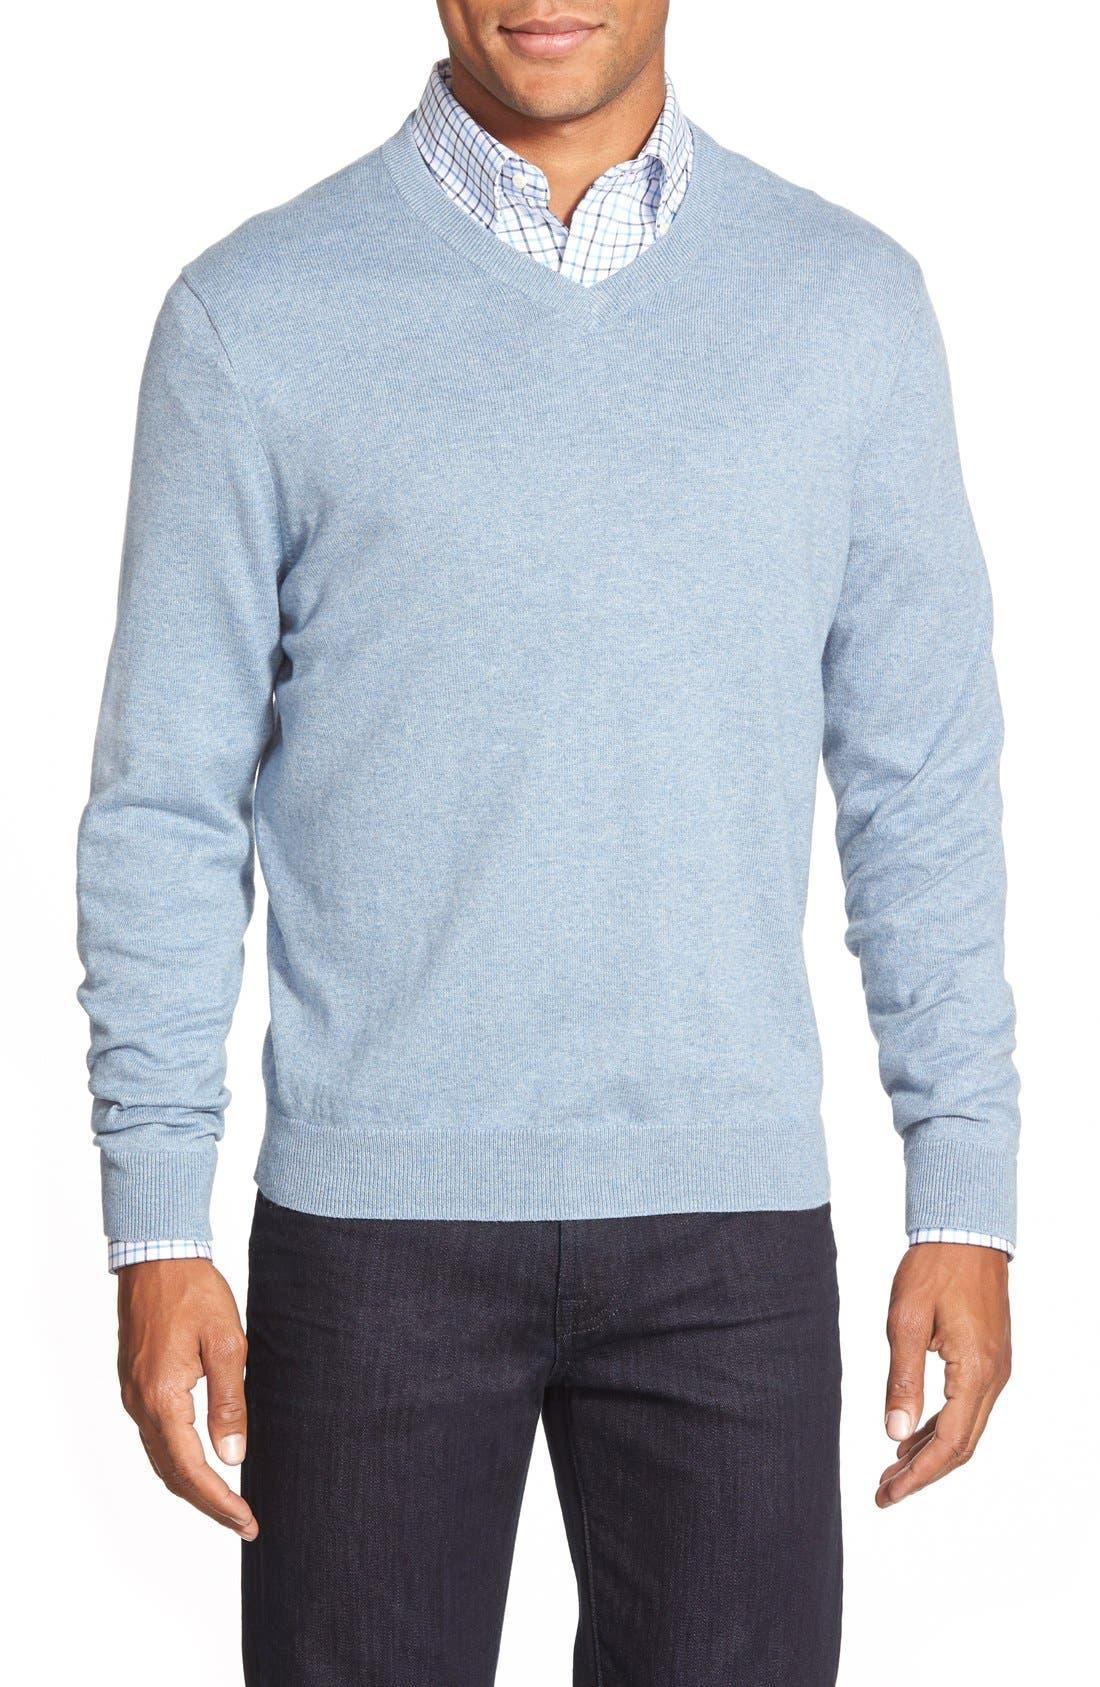 Cotton & Cashmere V-Neck Sweater,                         Main,                         color, Blue Celestial Heather